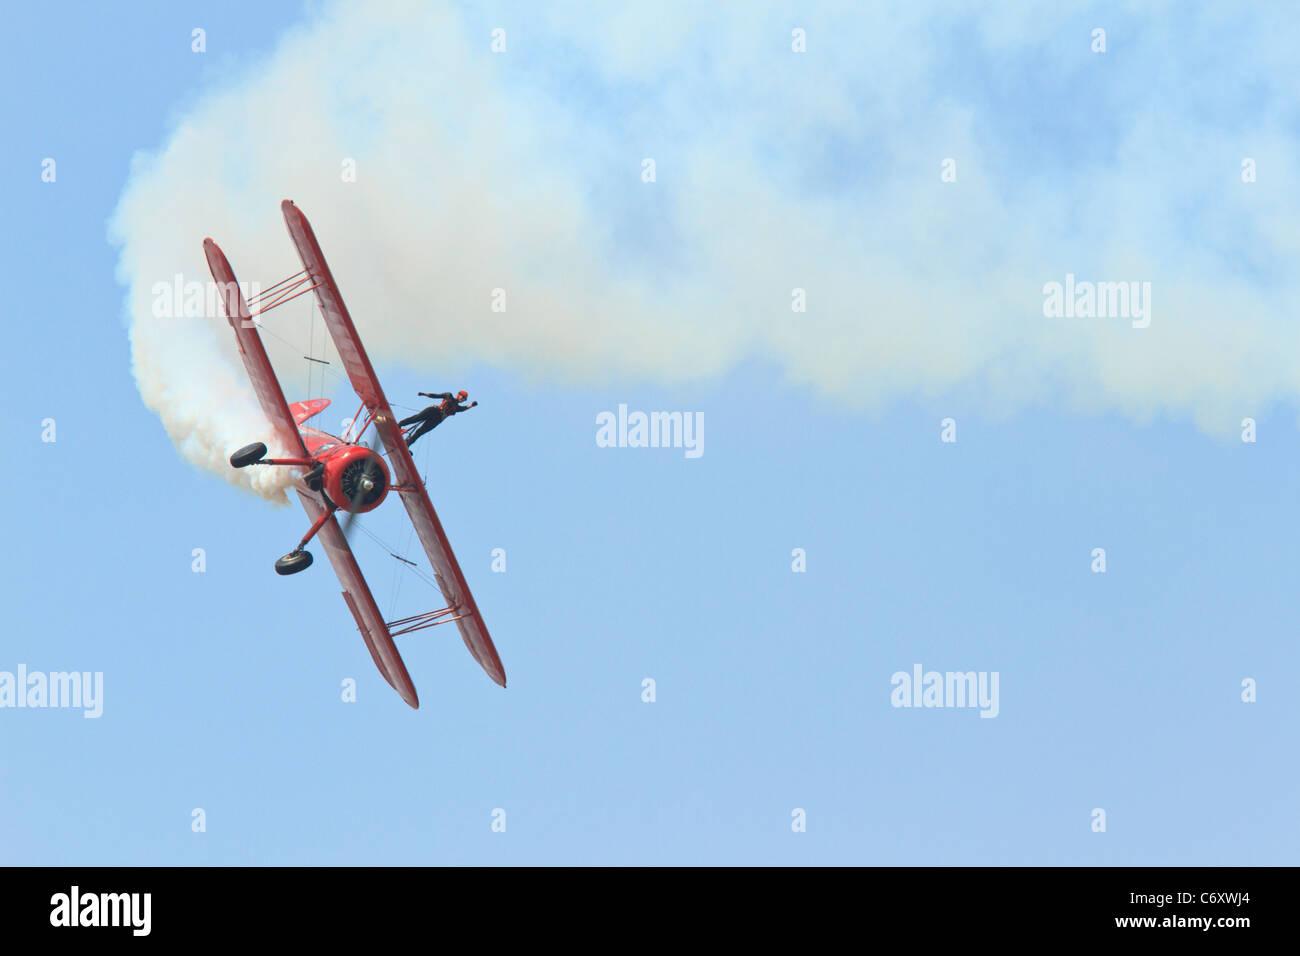 Biplane with wingwalker. - Stock Image